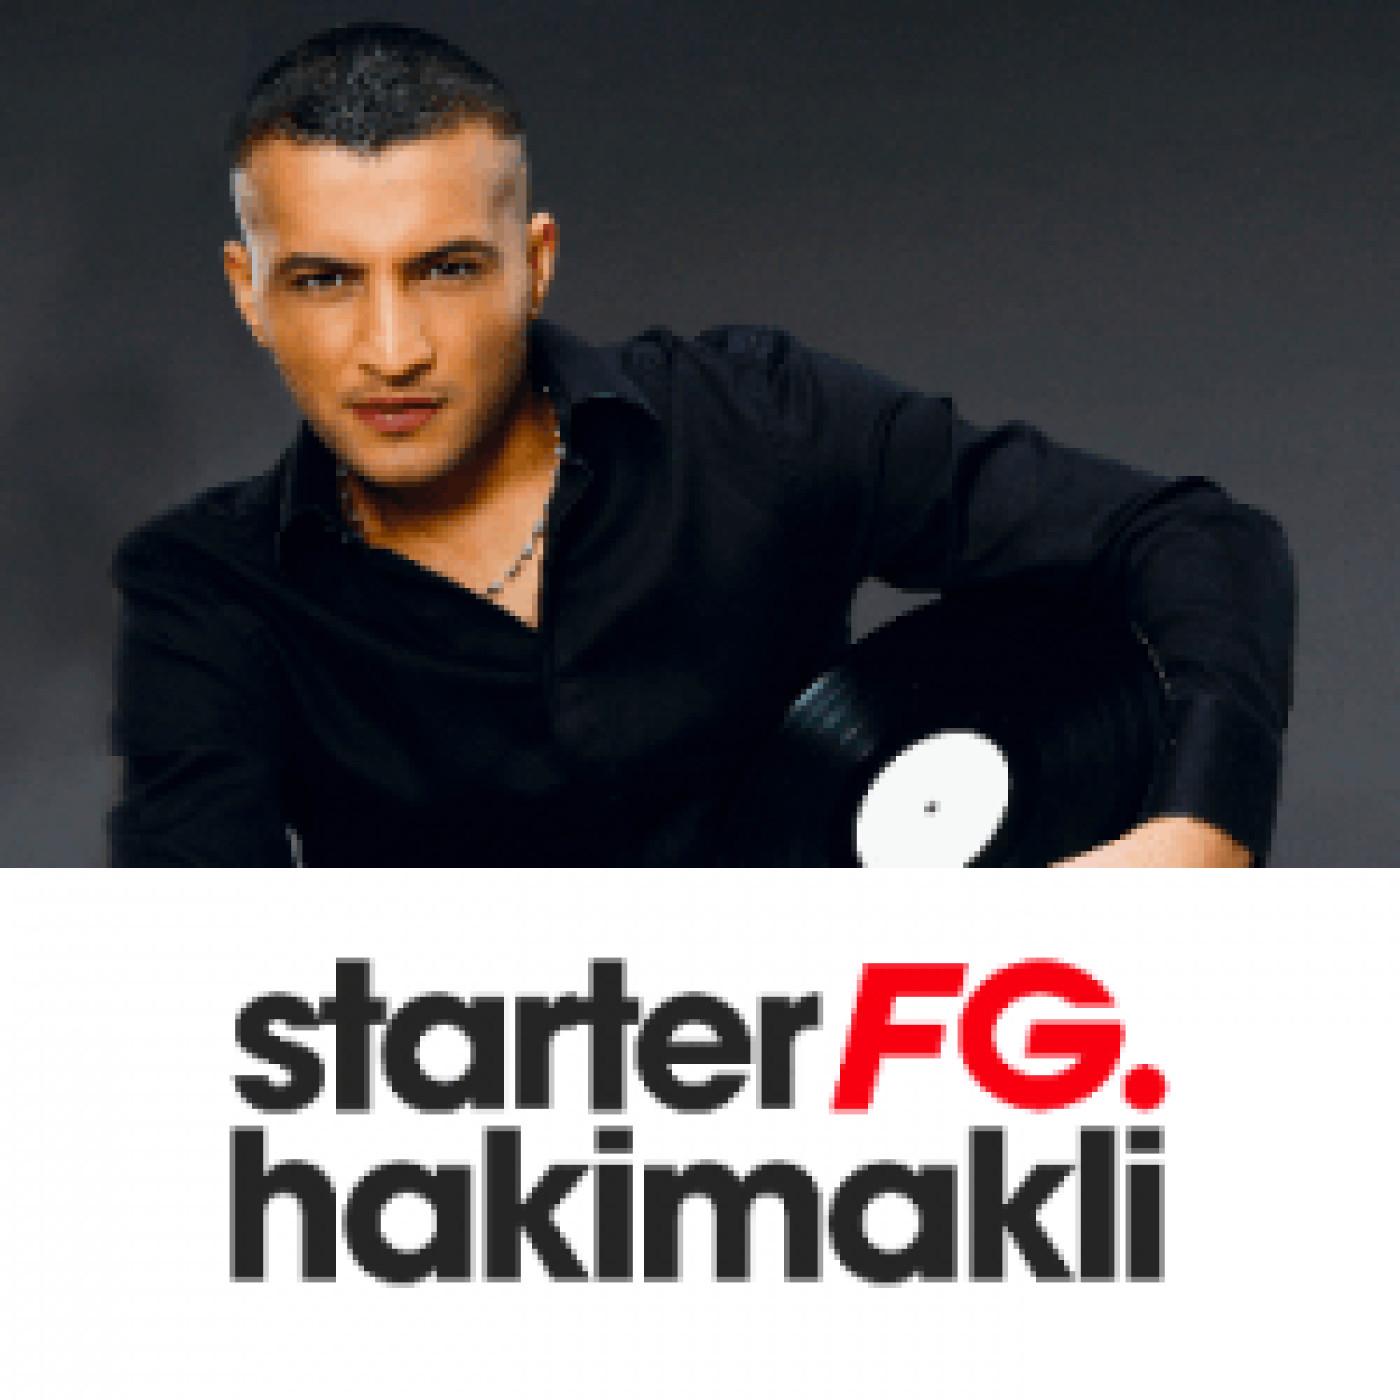 STARTER FG BY HAKIMAKLI MERCREDI 7 OCTOBRE 2020